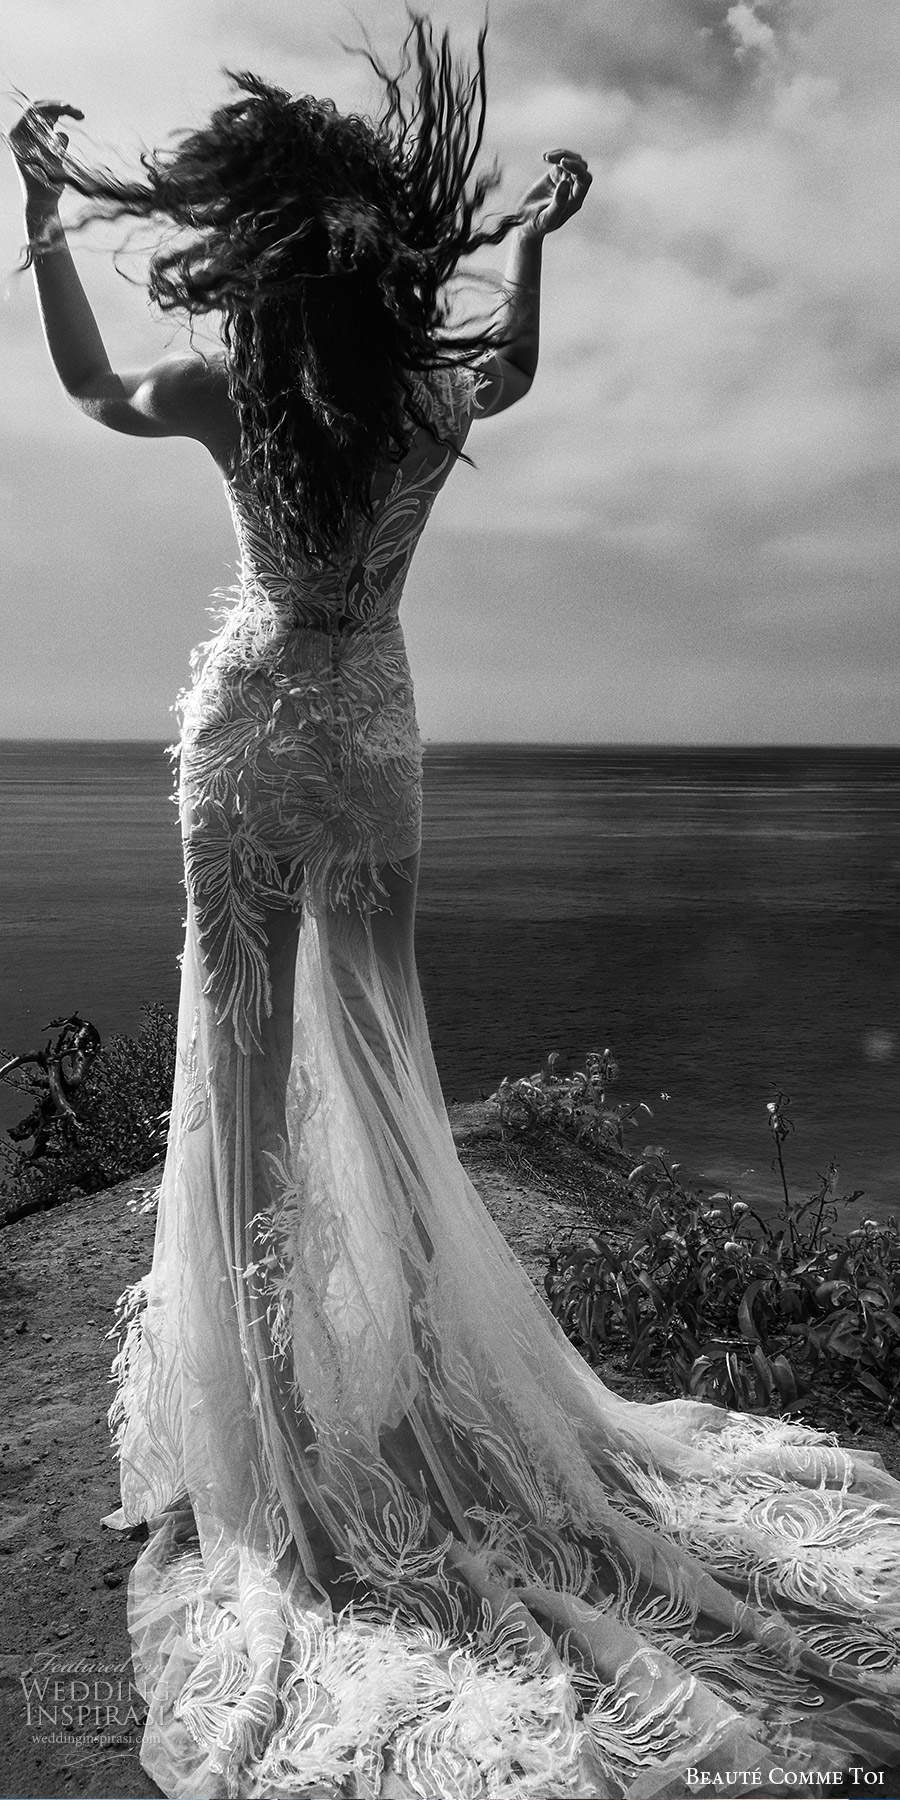 beaute comme toi f2020 bridal feather one shoulder sleeves illusion neckline full embellishment elegant glamorous fit and flare sheath wedding dress lace button back medium train (8) bv